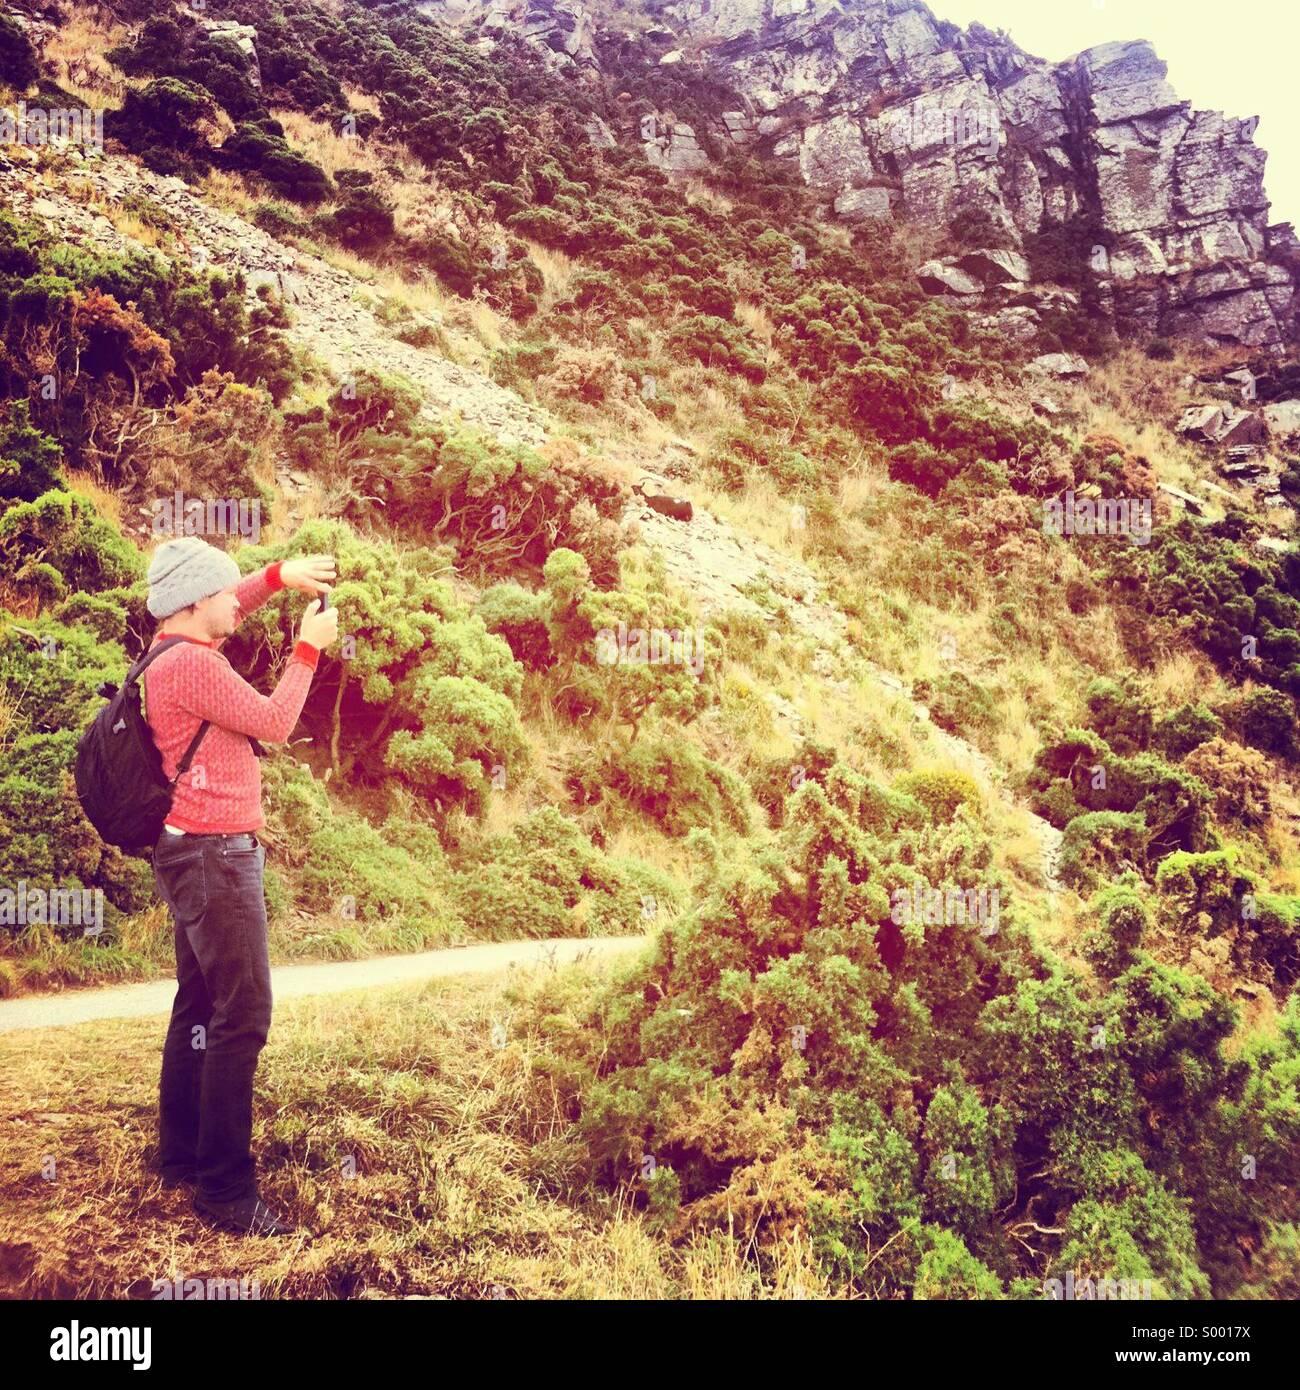 Man taking photograph - Stock Image